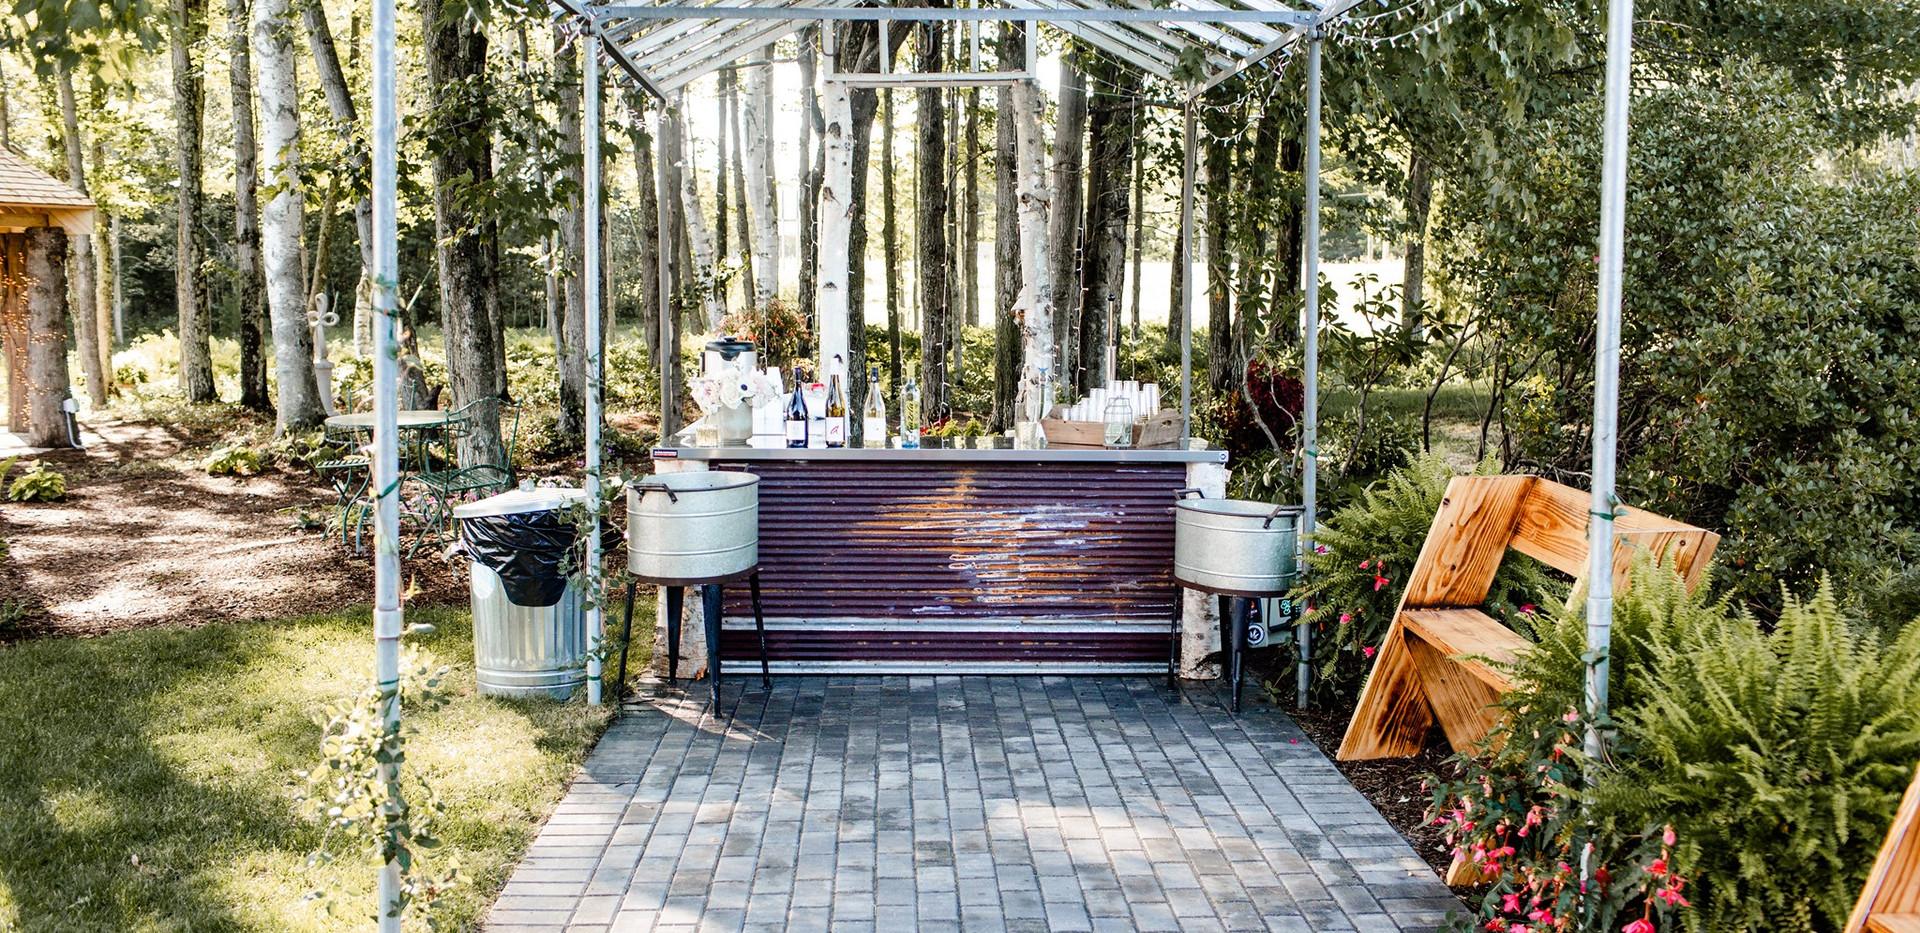 Outdoor bar with pergola